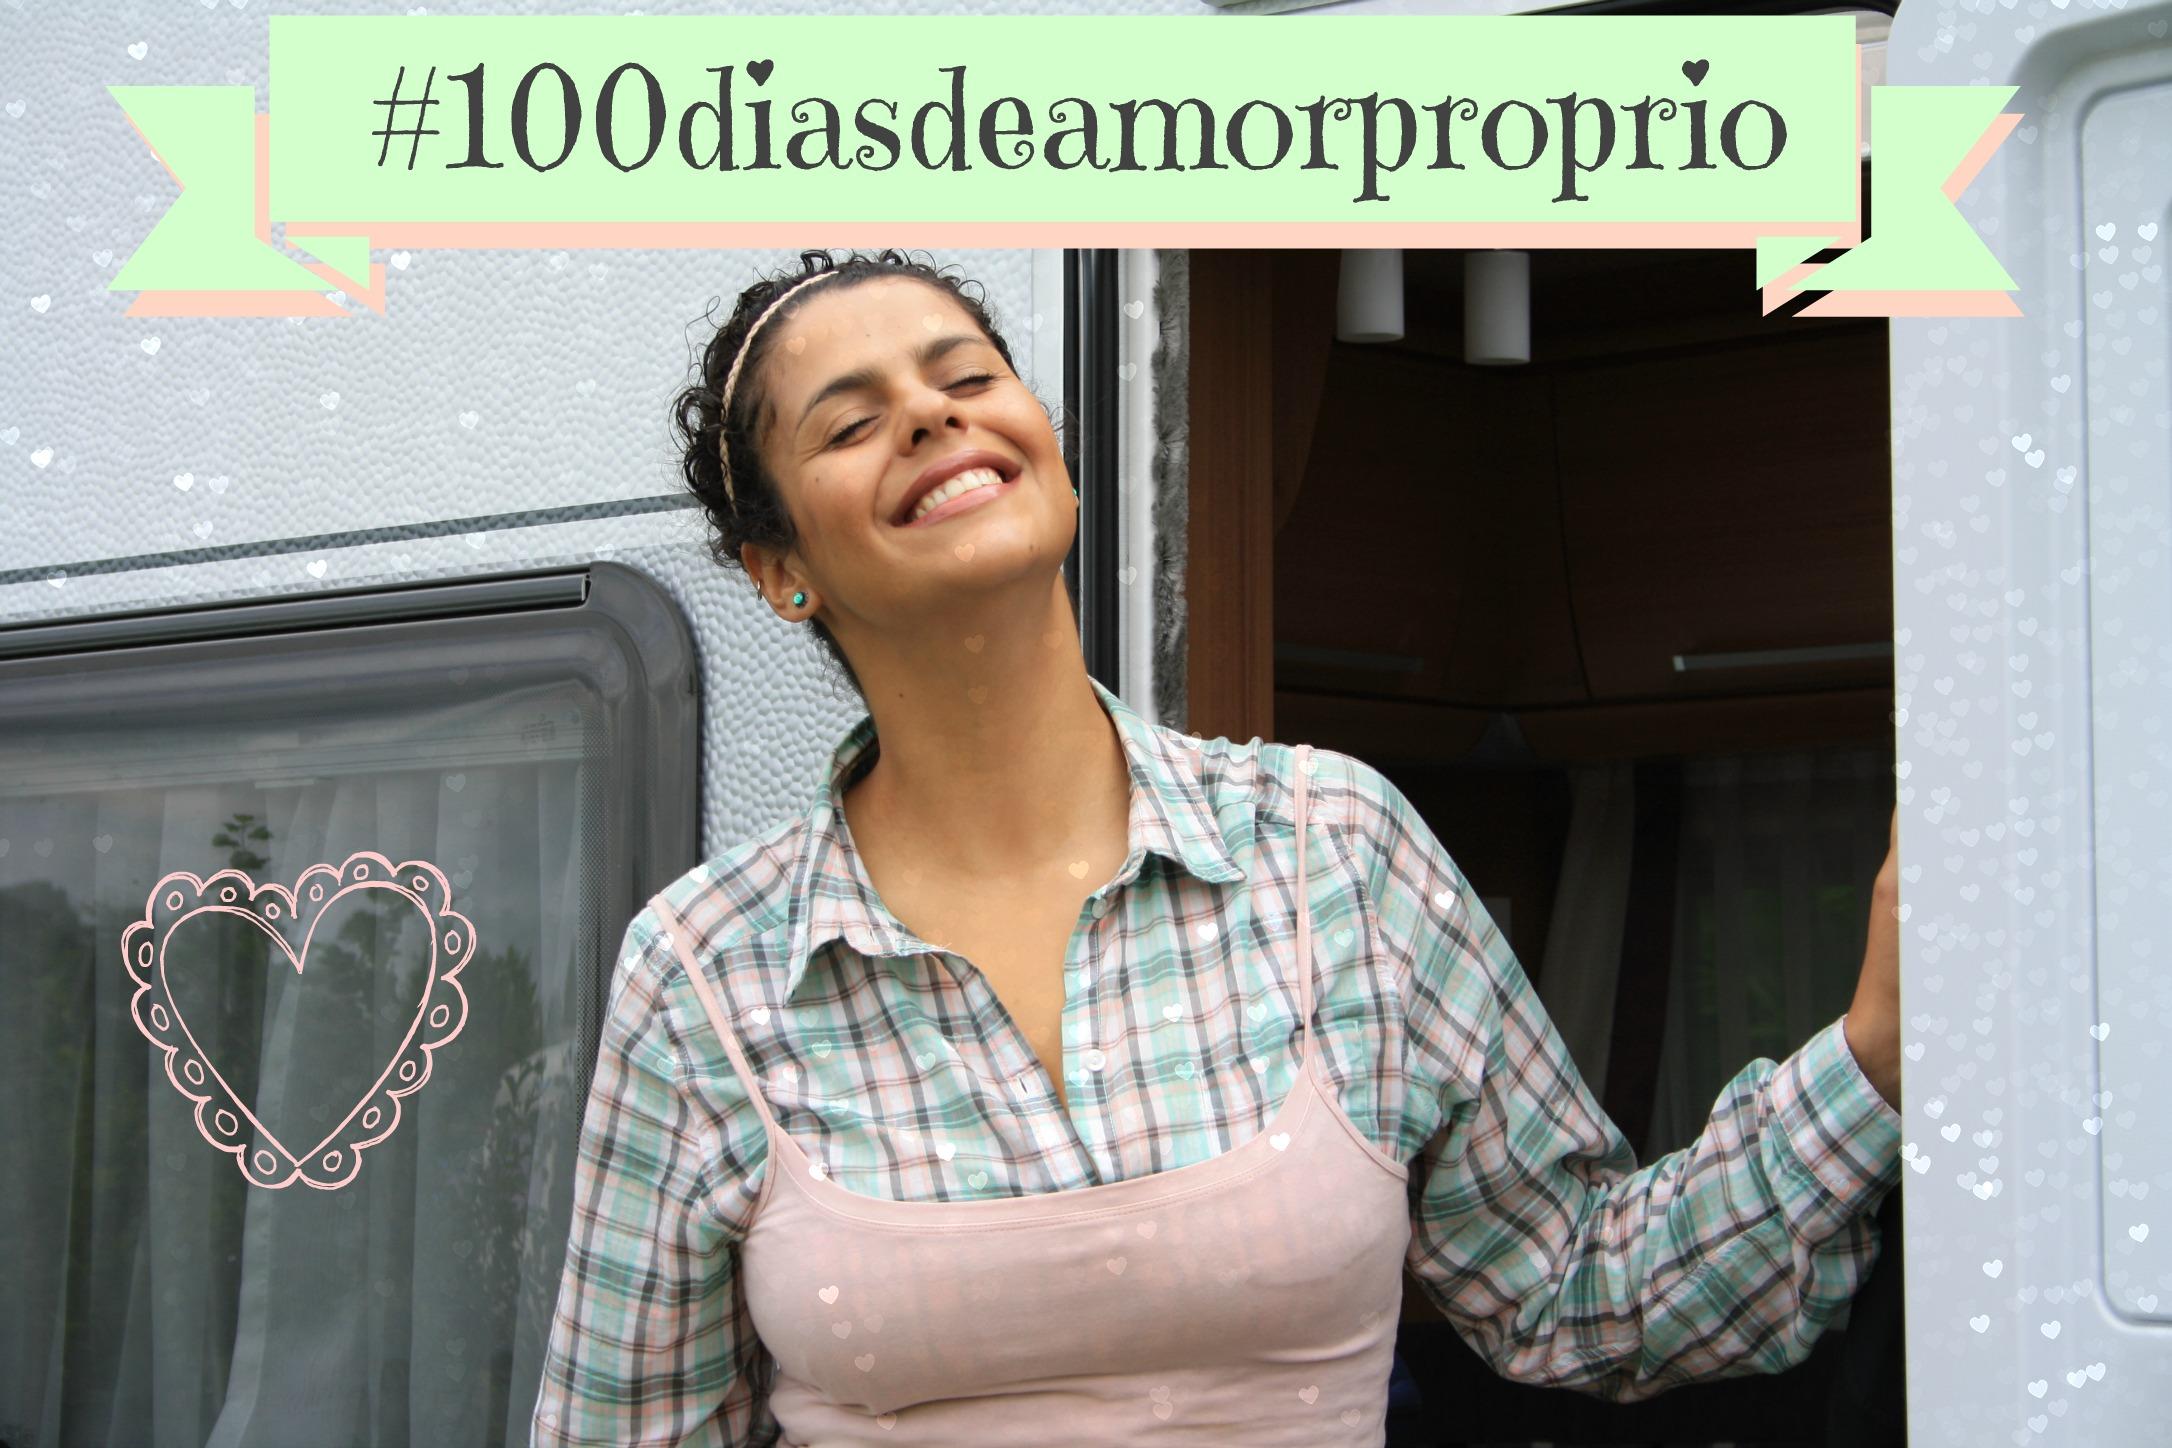 #100diasdeamorproprio brigadeiro de alface erika elenbaas